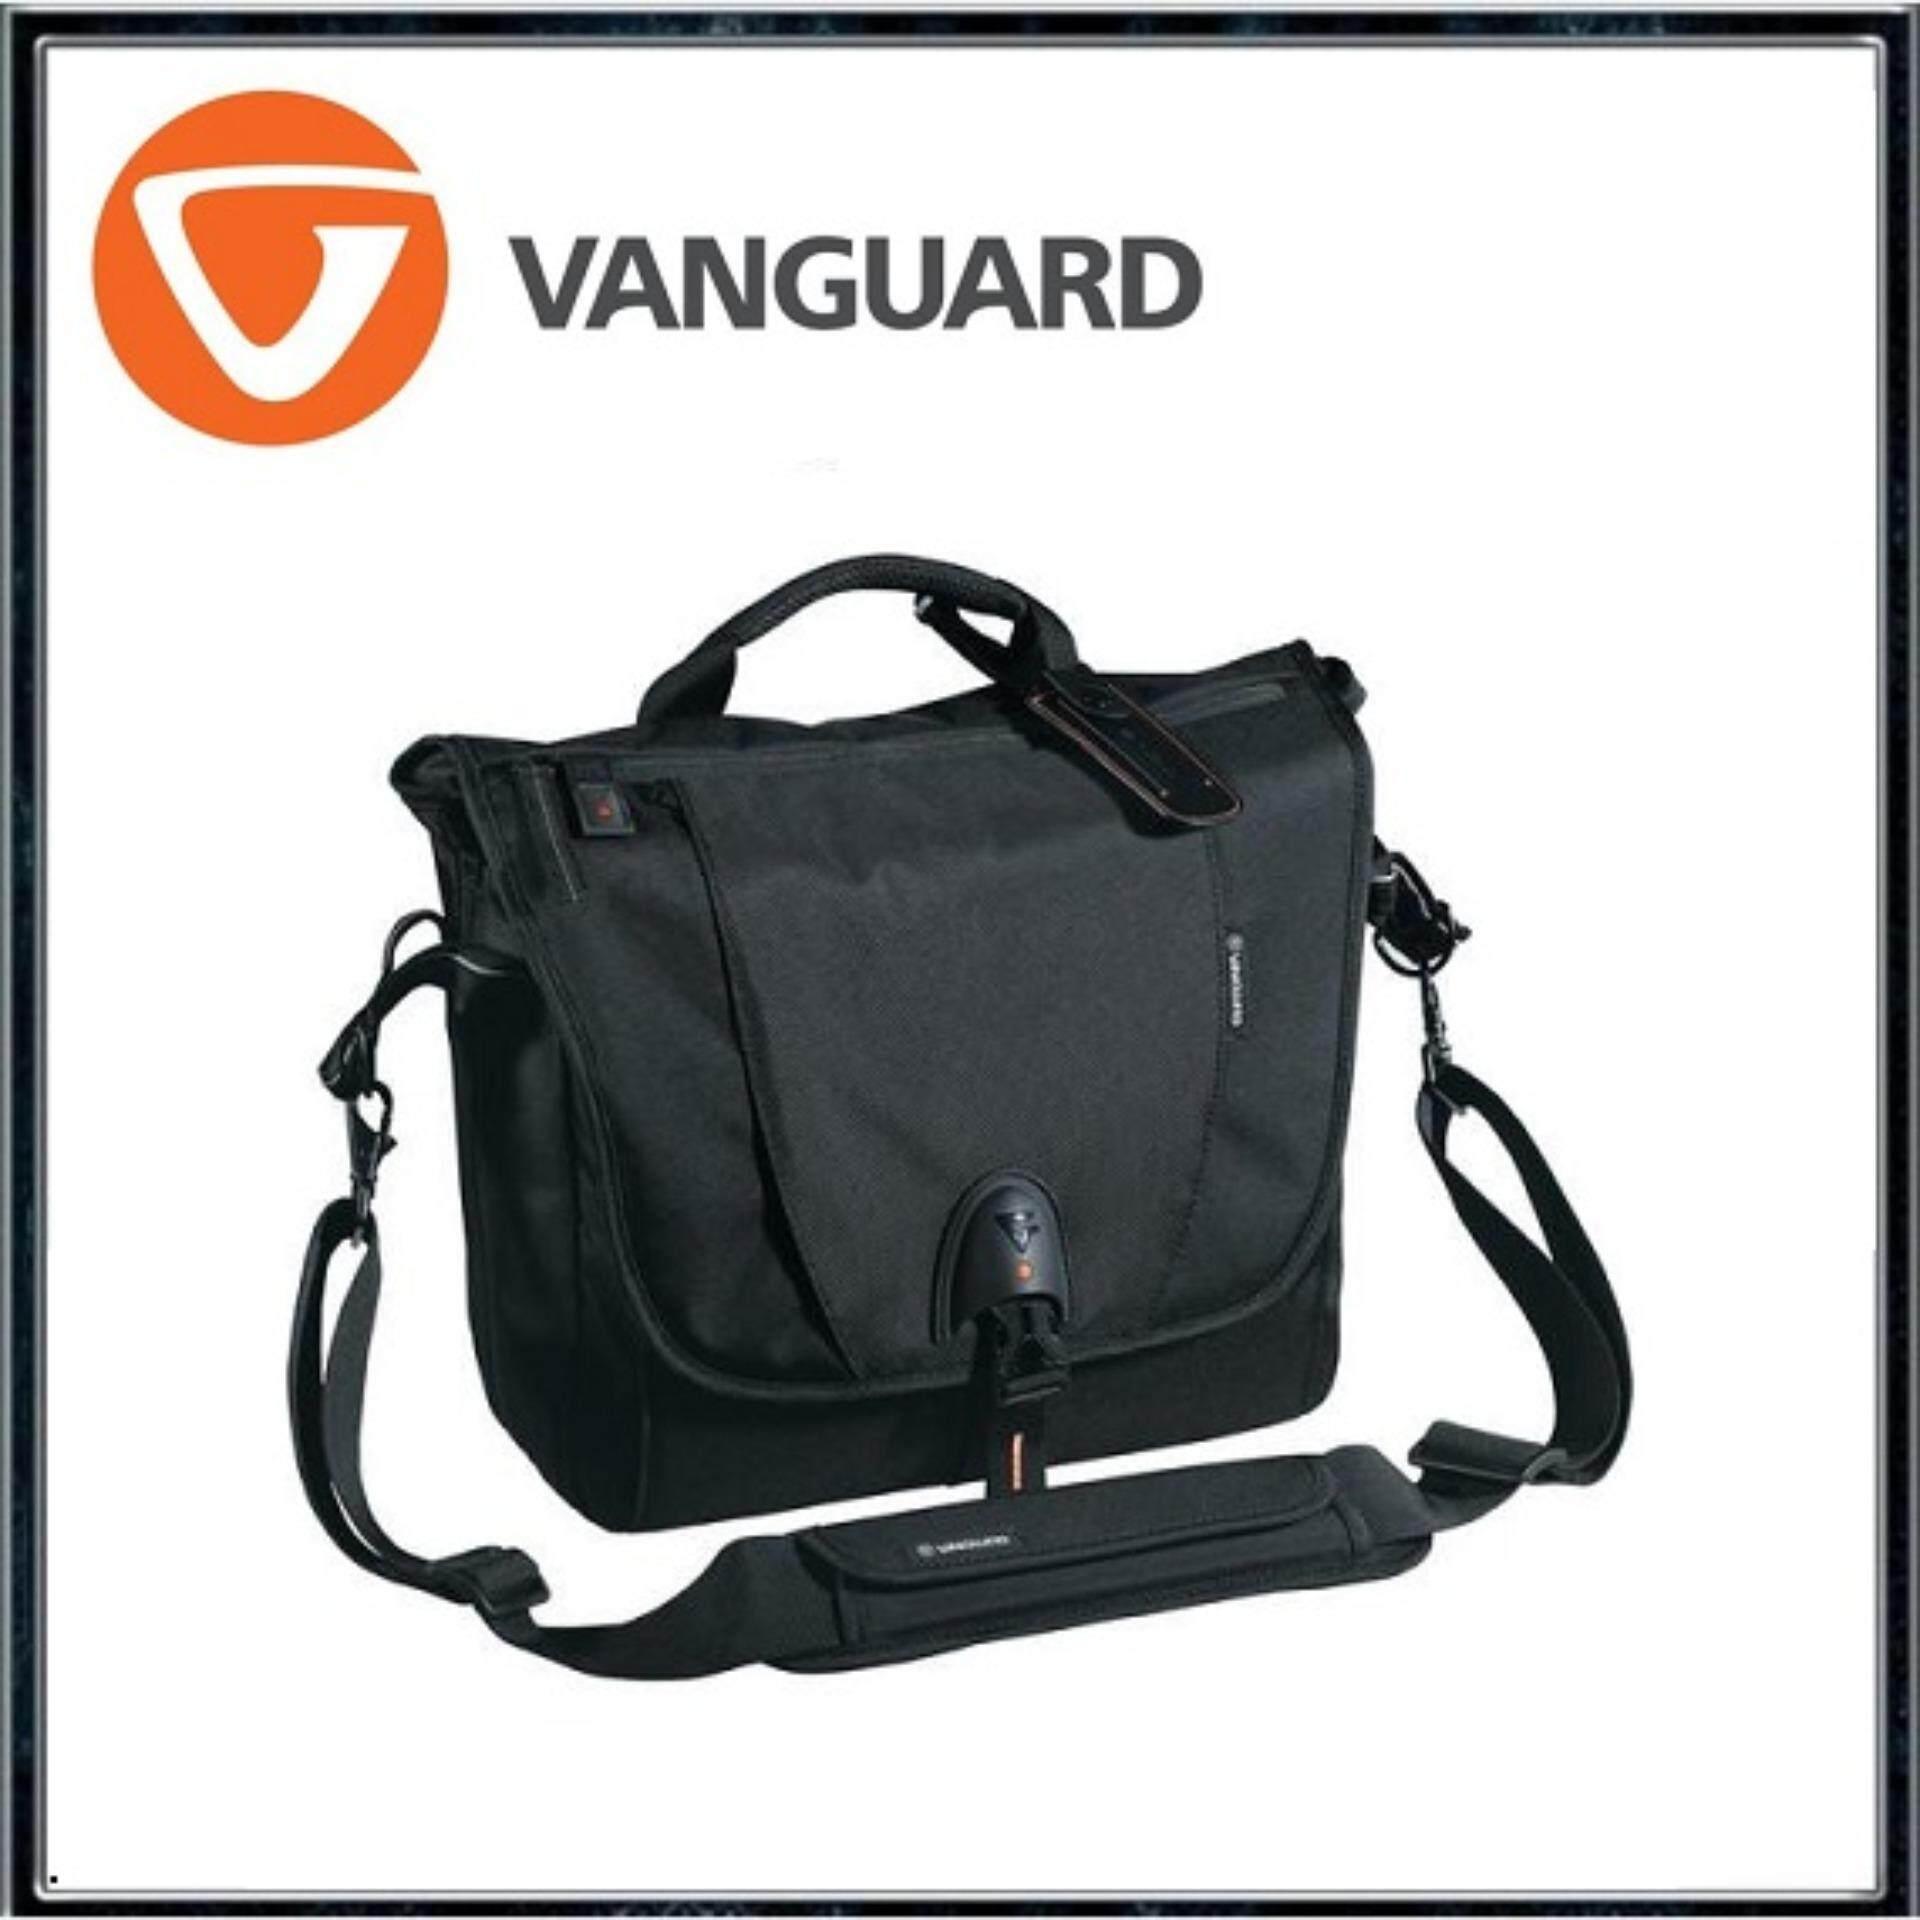 Vanguard UP-RISE 28 Messenger Bag [READY STOCK]